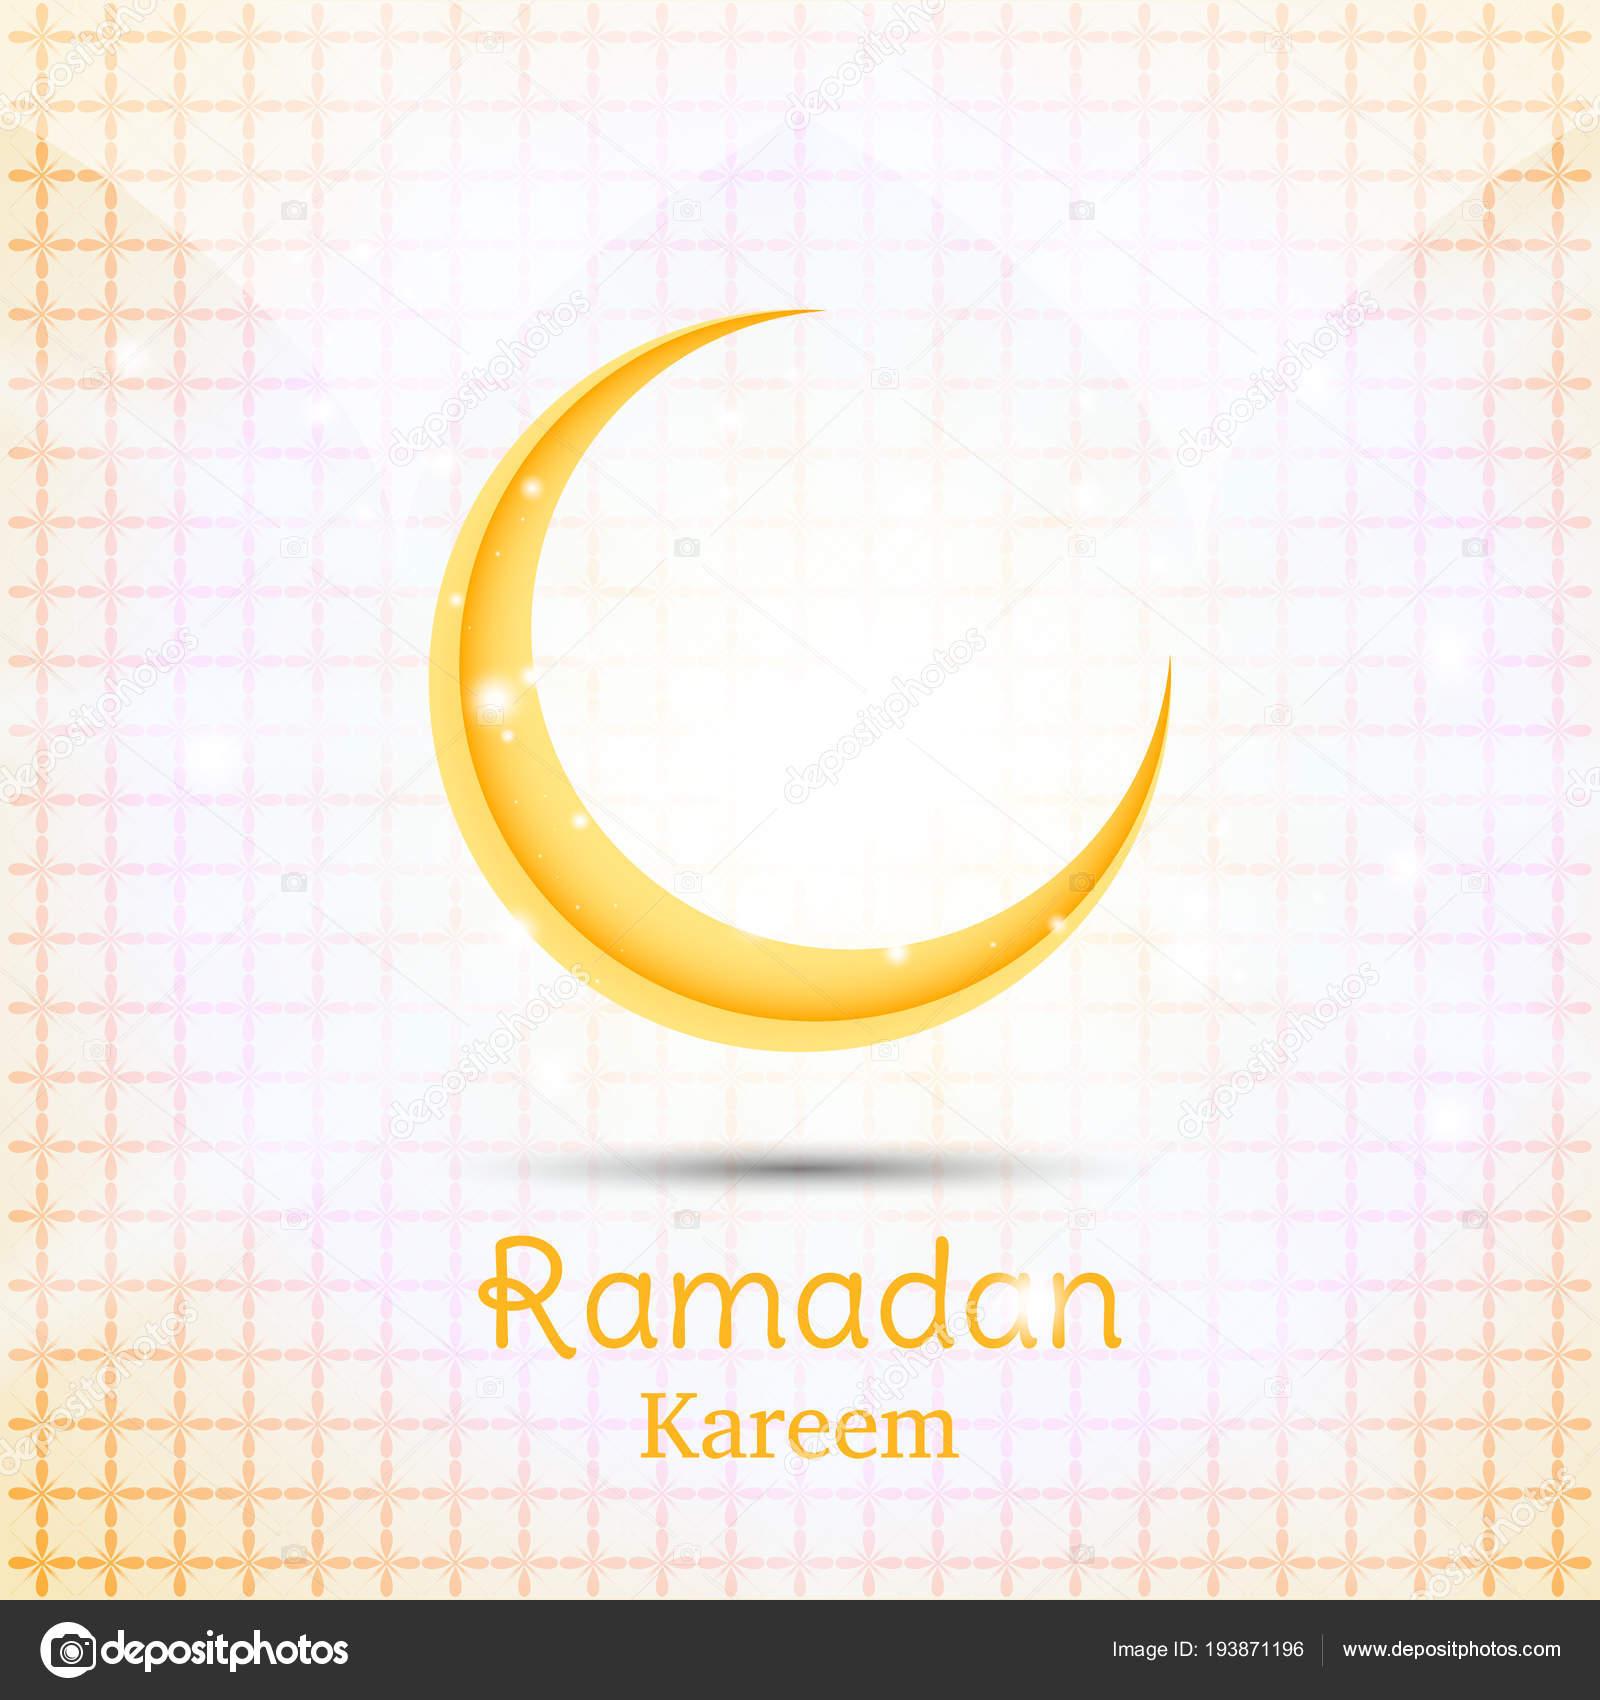 muslim feast of the holy month of ramadan kareem greeting card